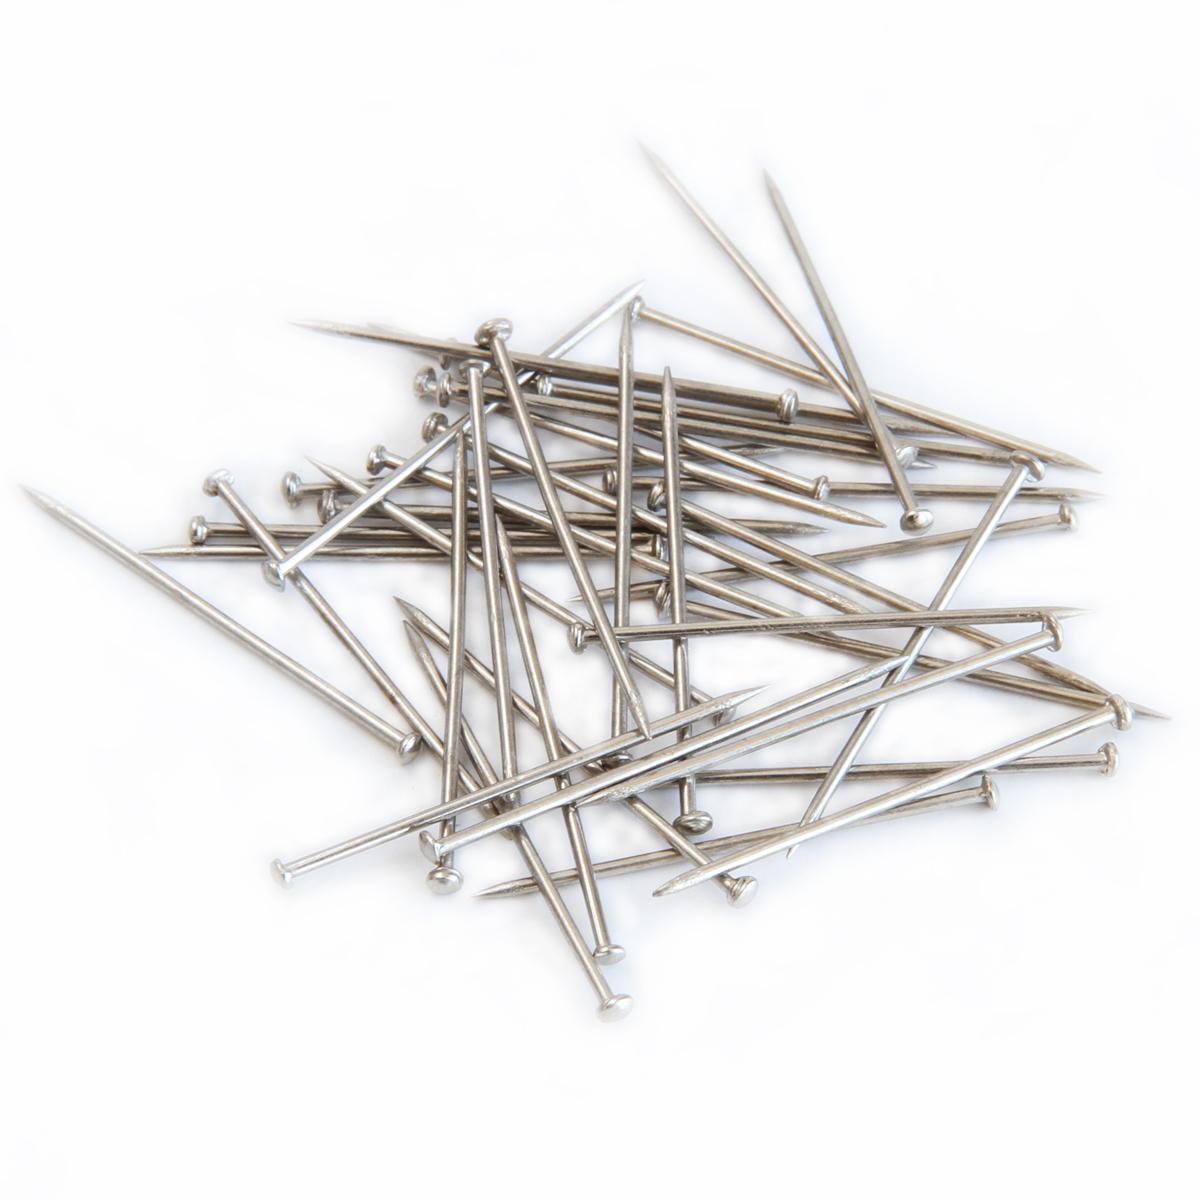 deli得力0016大头针不锈钢固定针镀镍办公定位针50枚办公文具